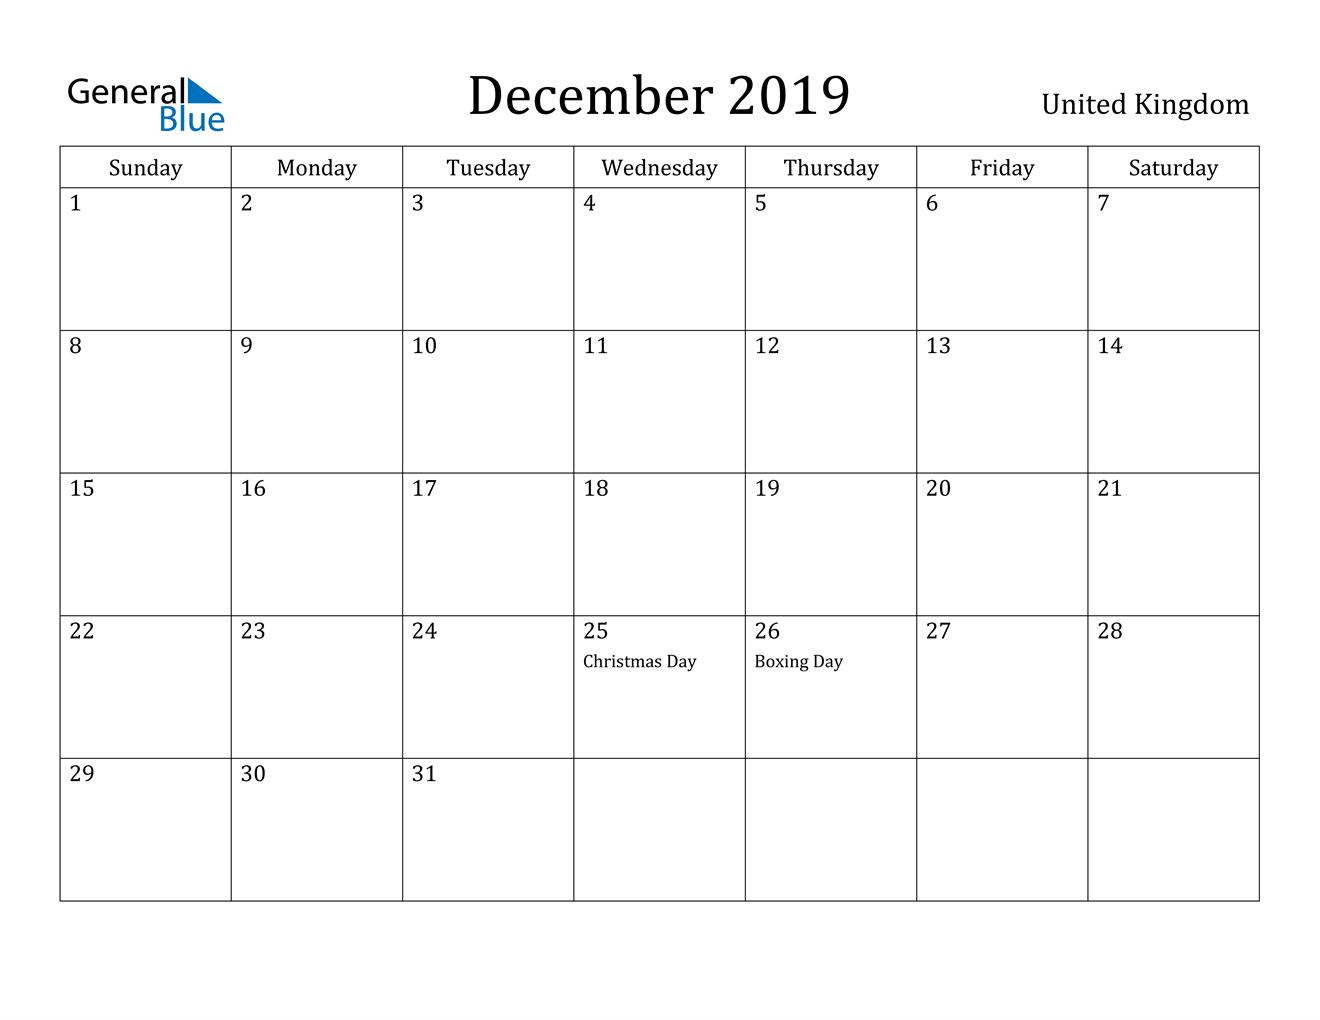 Image of December 2019 United Kingdom Calendar with Holidays Calendar